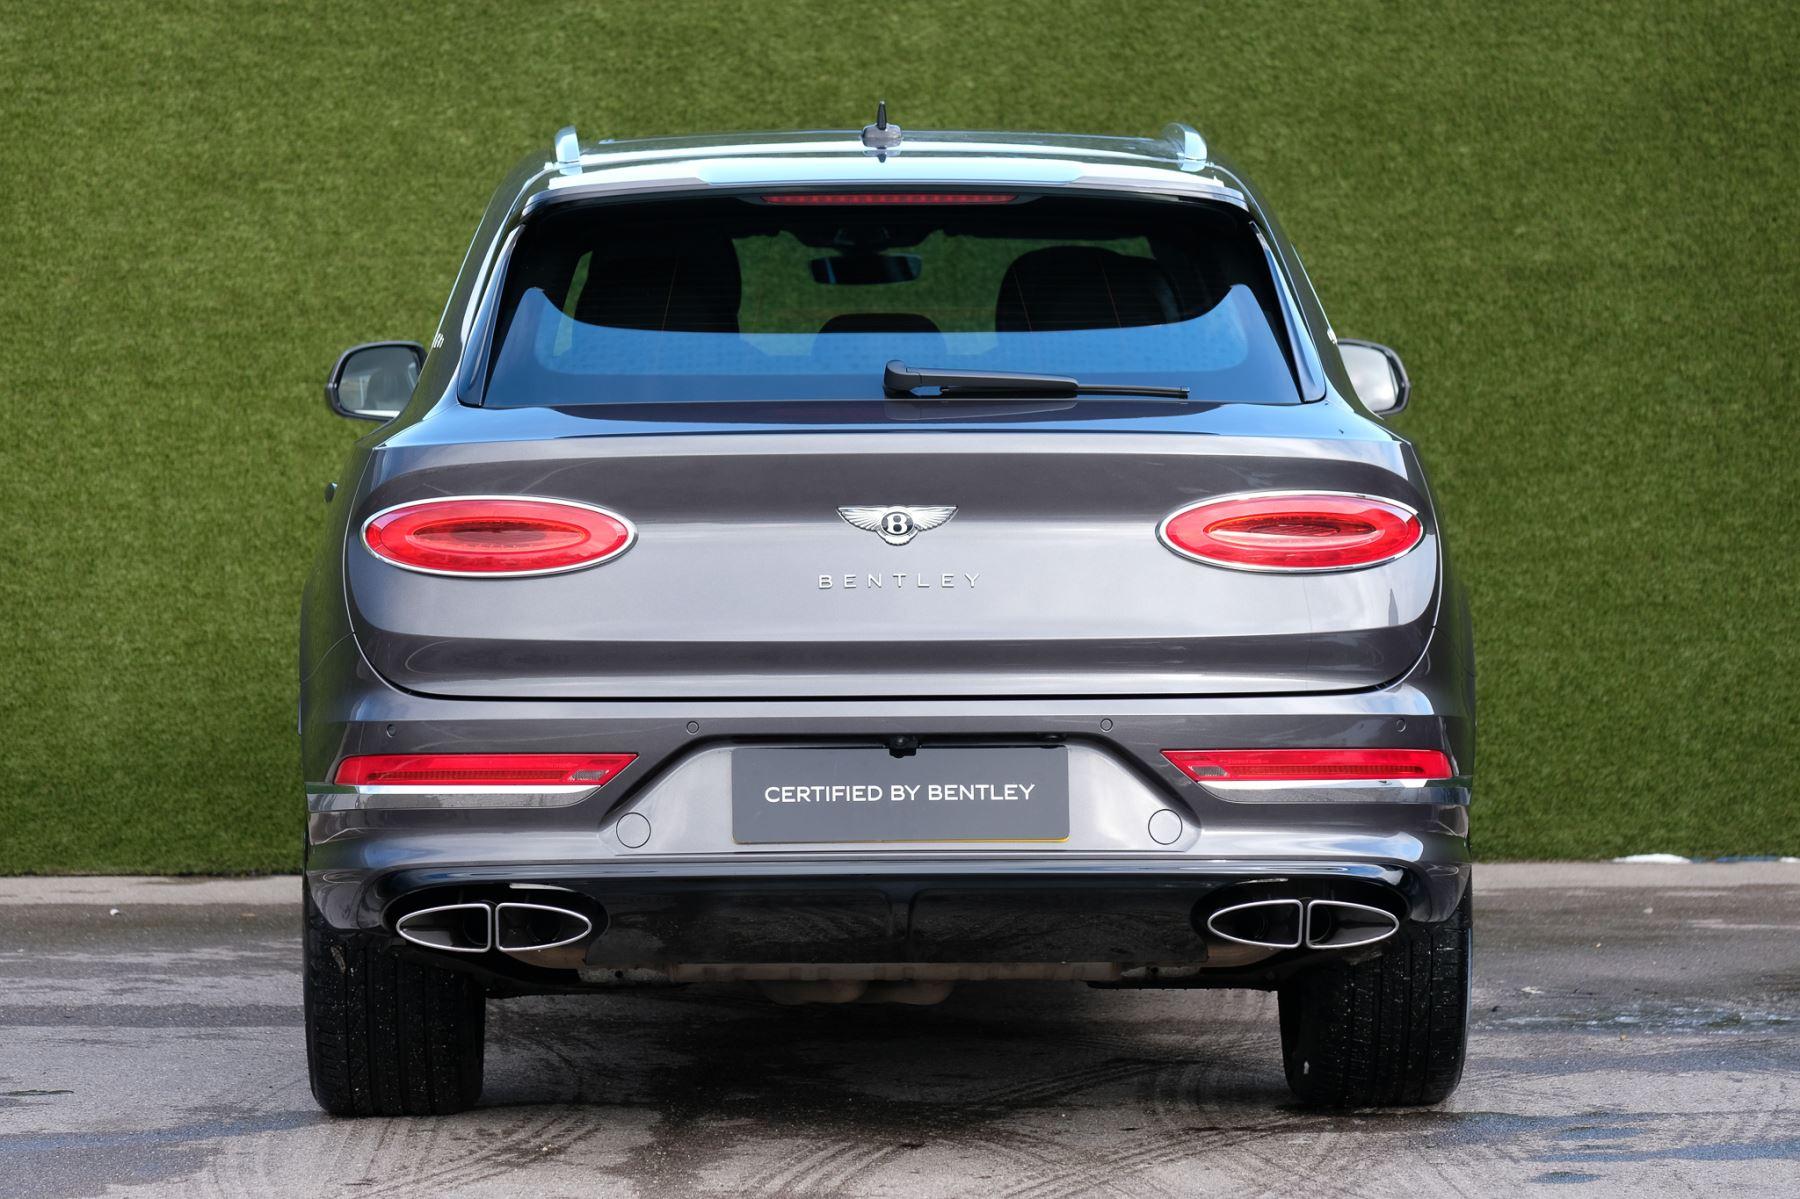 Bentley Bentayga First Edition 4.0 V8  image 4